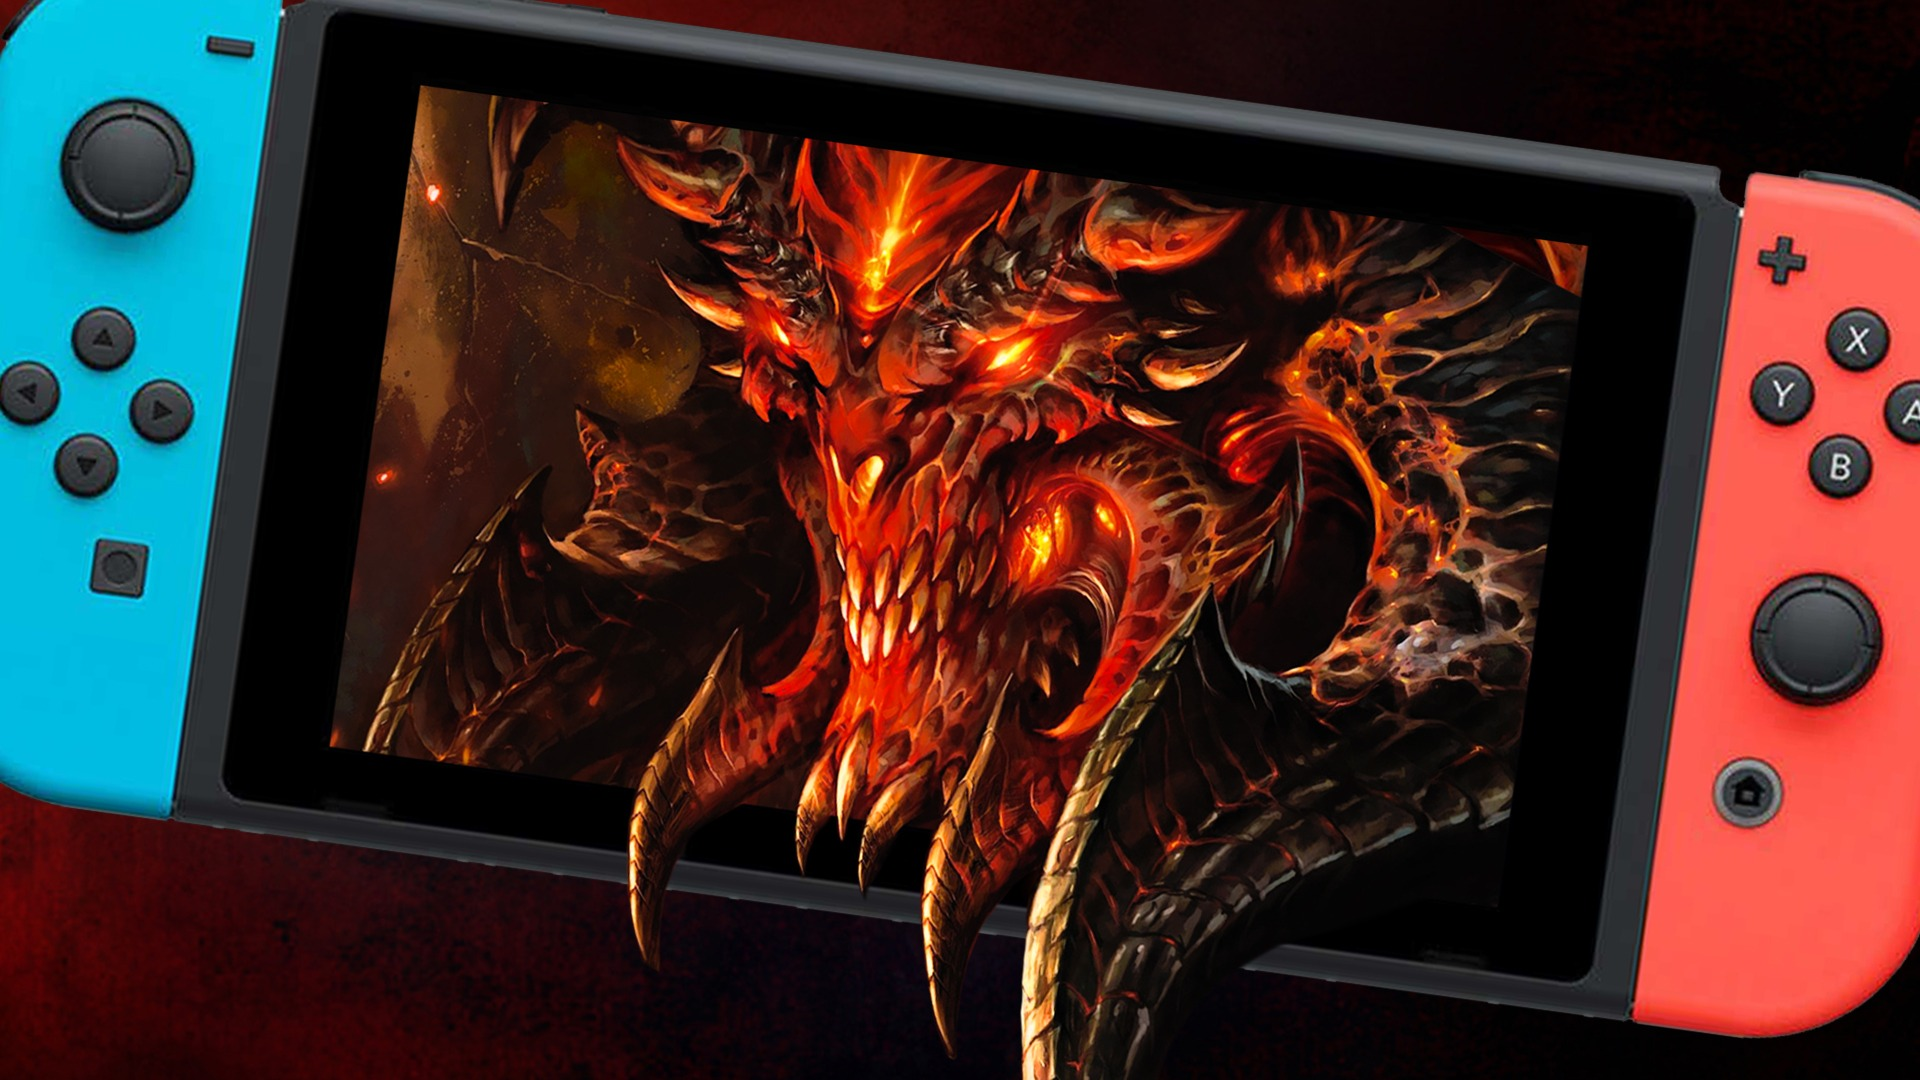 Diablo III, Fortnite, Nintendo Switch